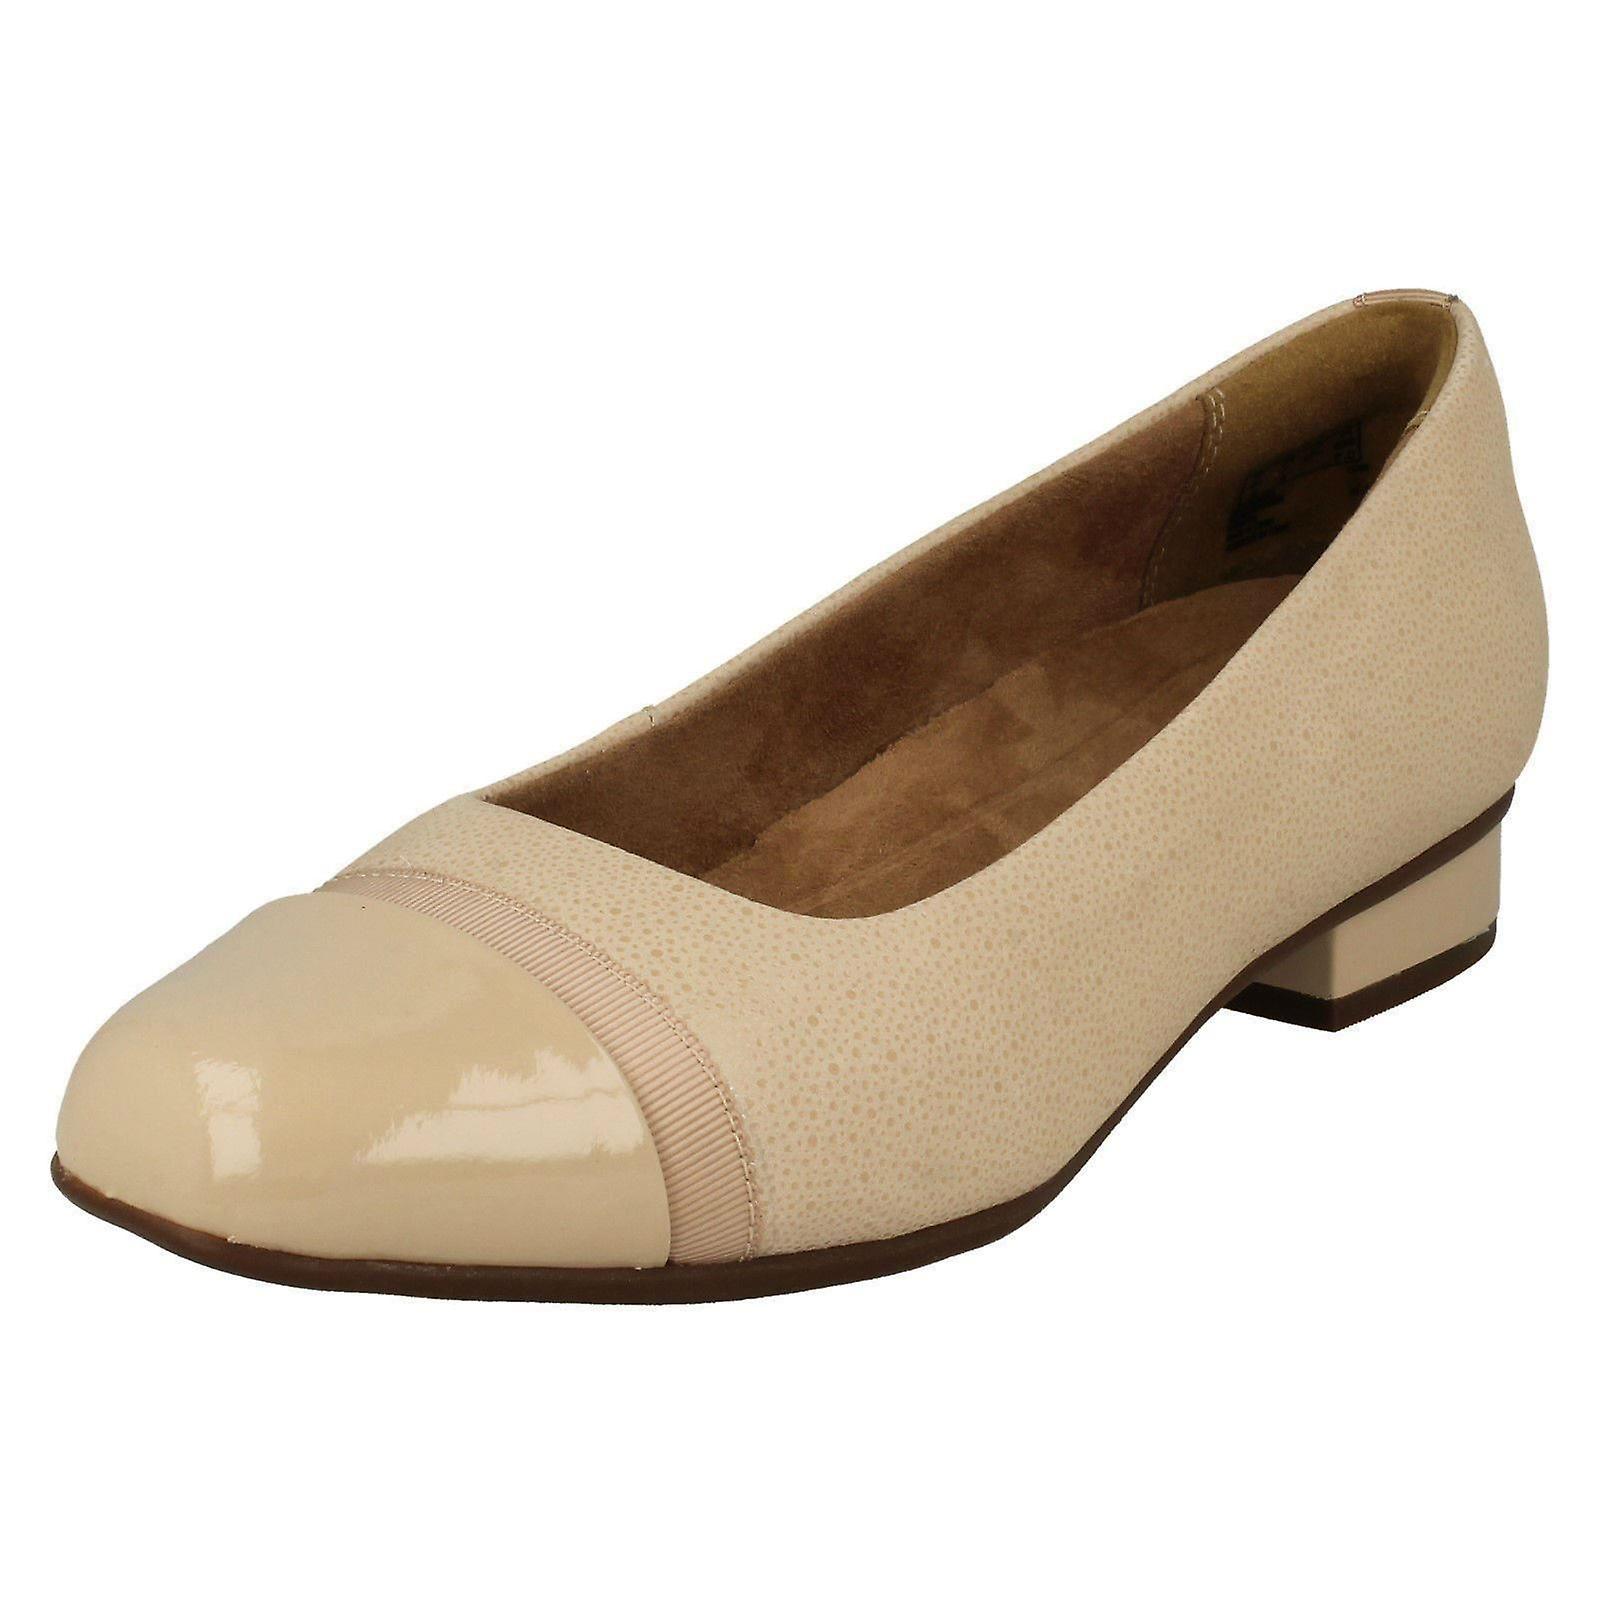 Clarks Keesha Rosa Nude Interest 26132358 - Everyday Shoes